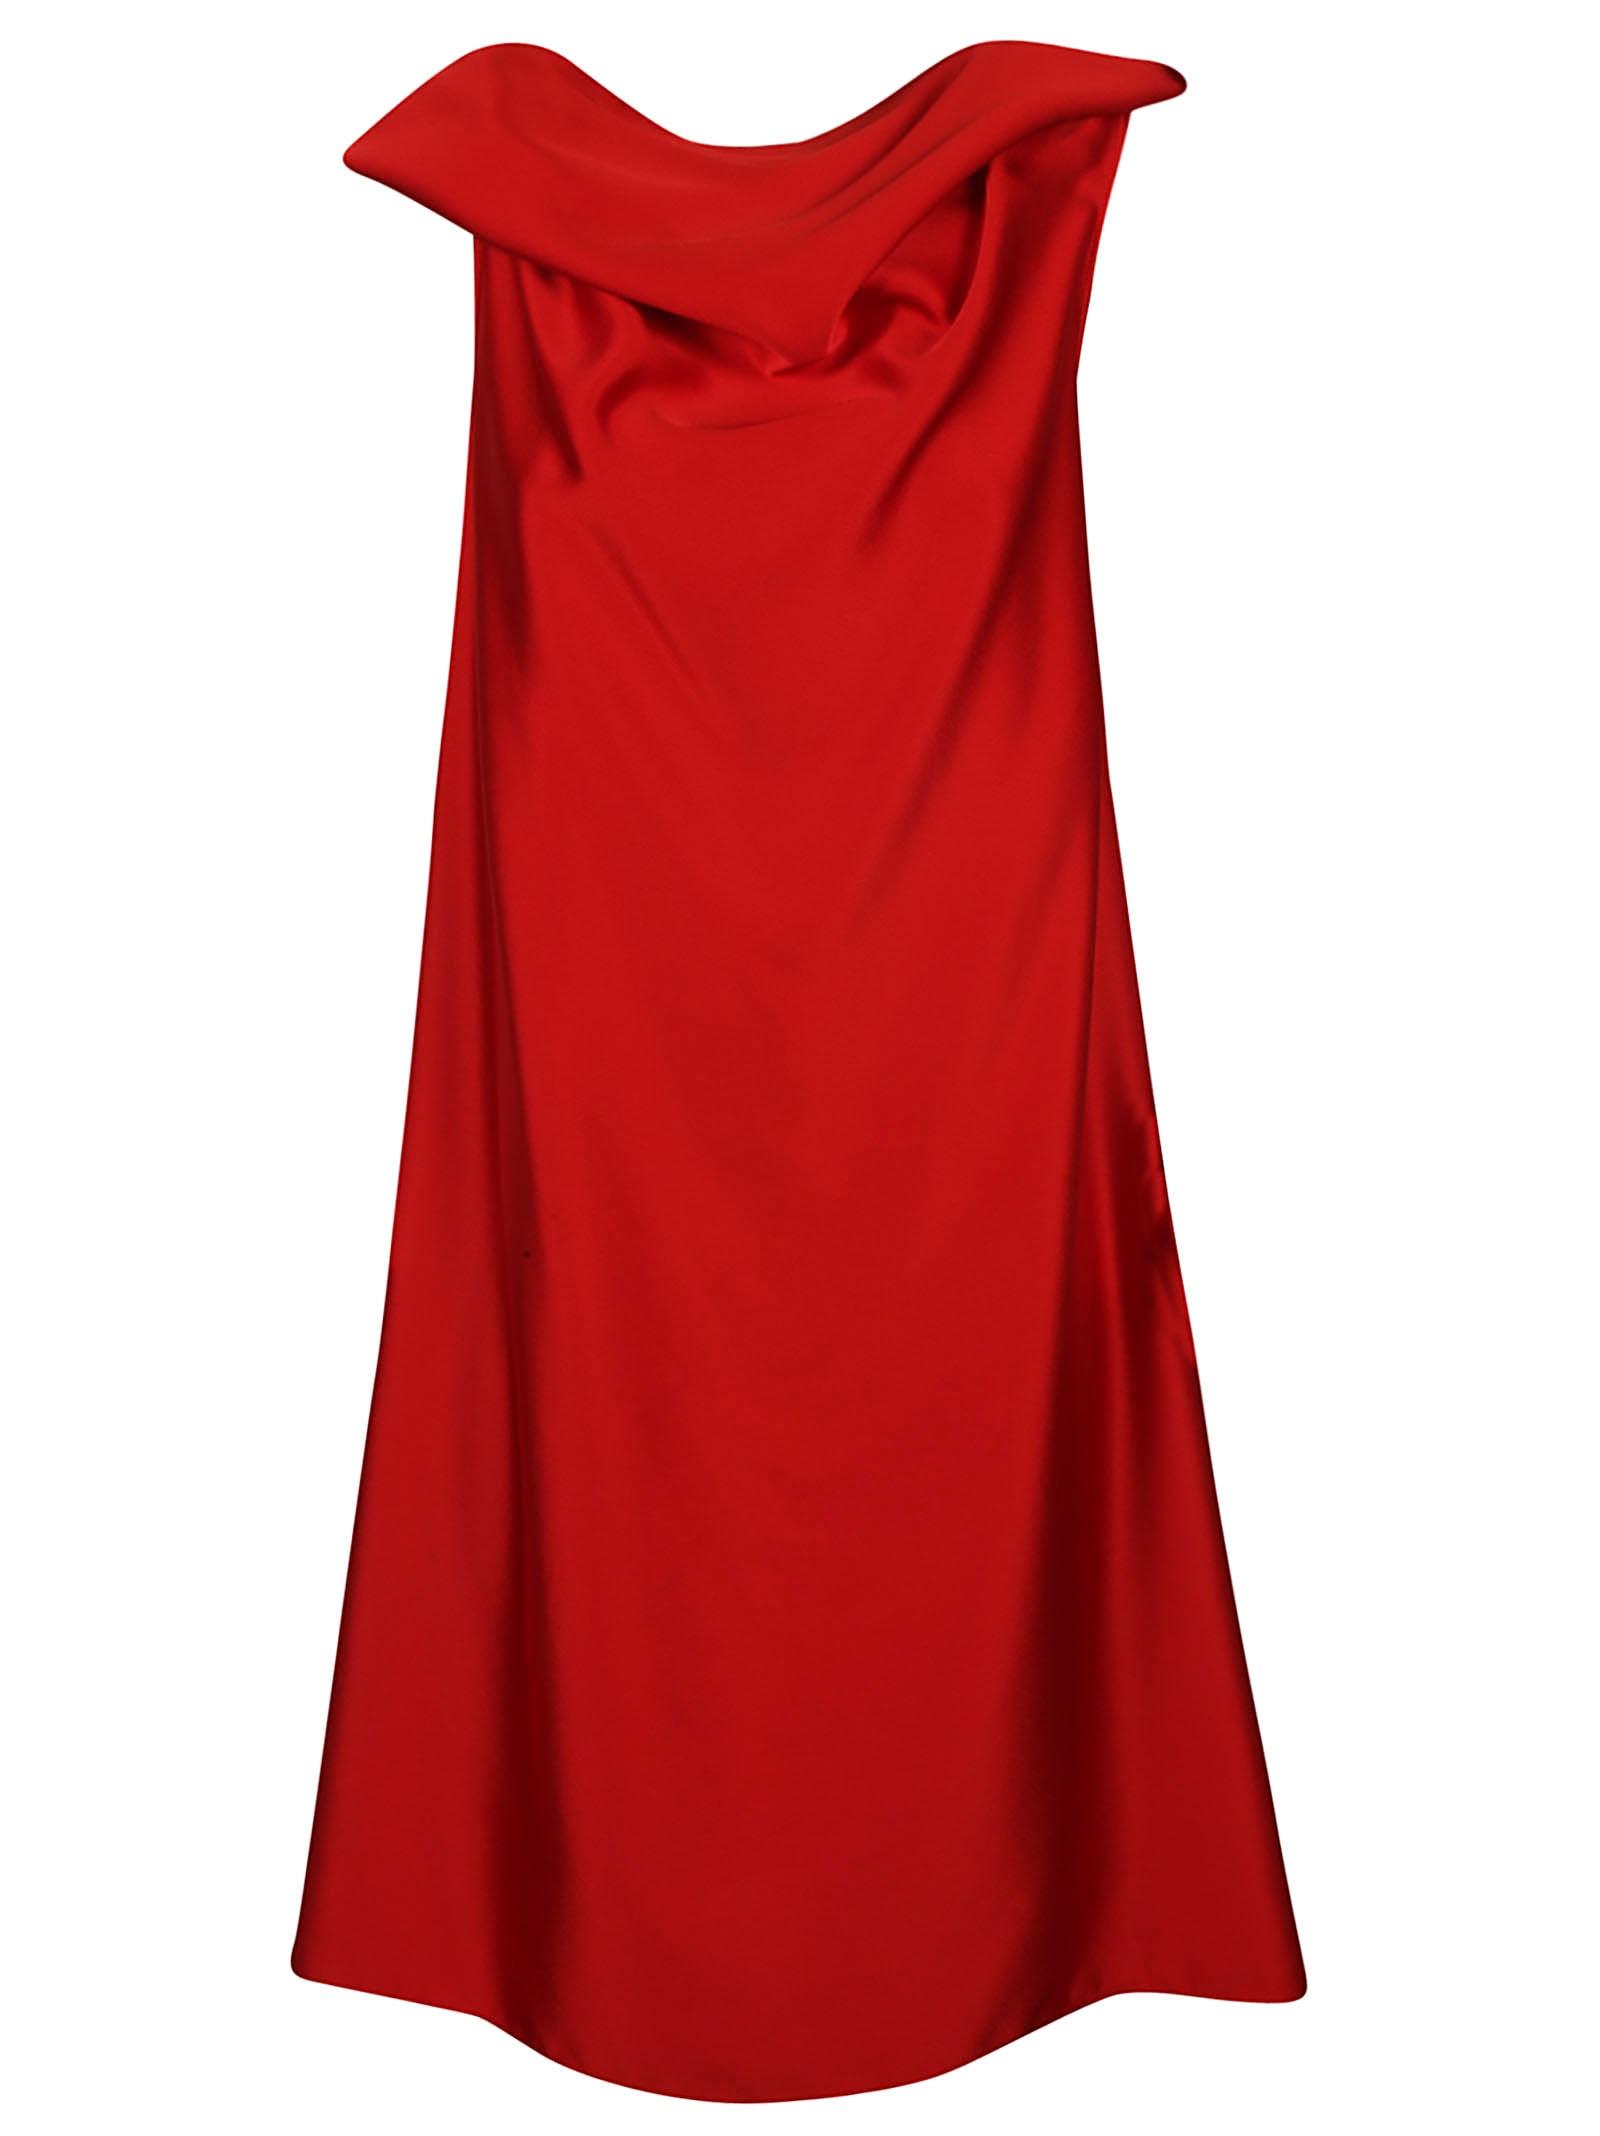 Neil Barrett Rear Zipped Dress